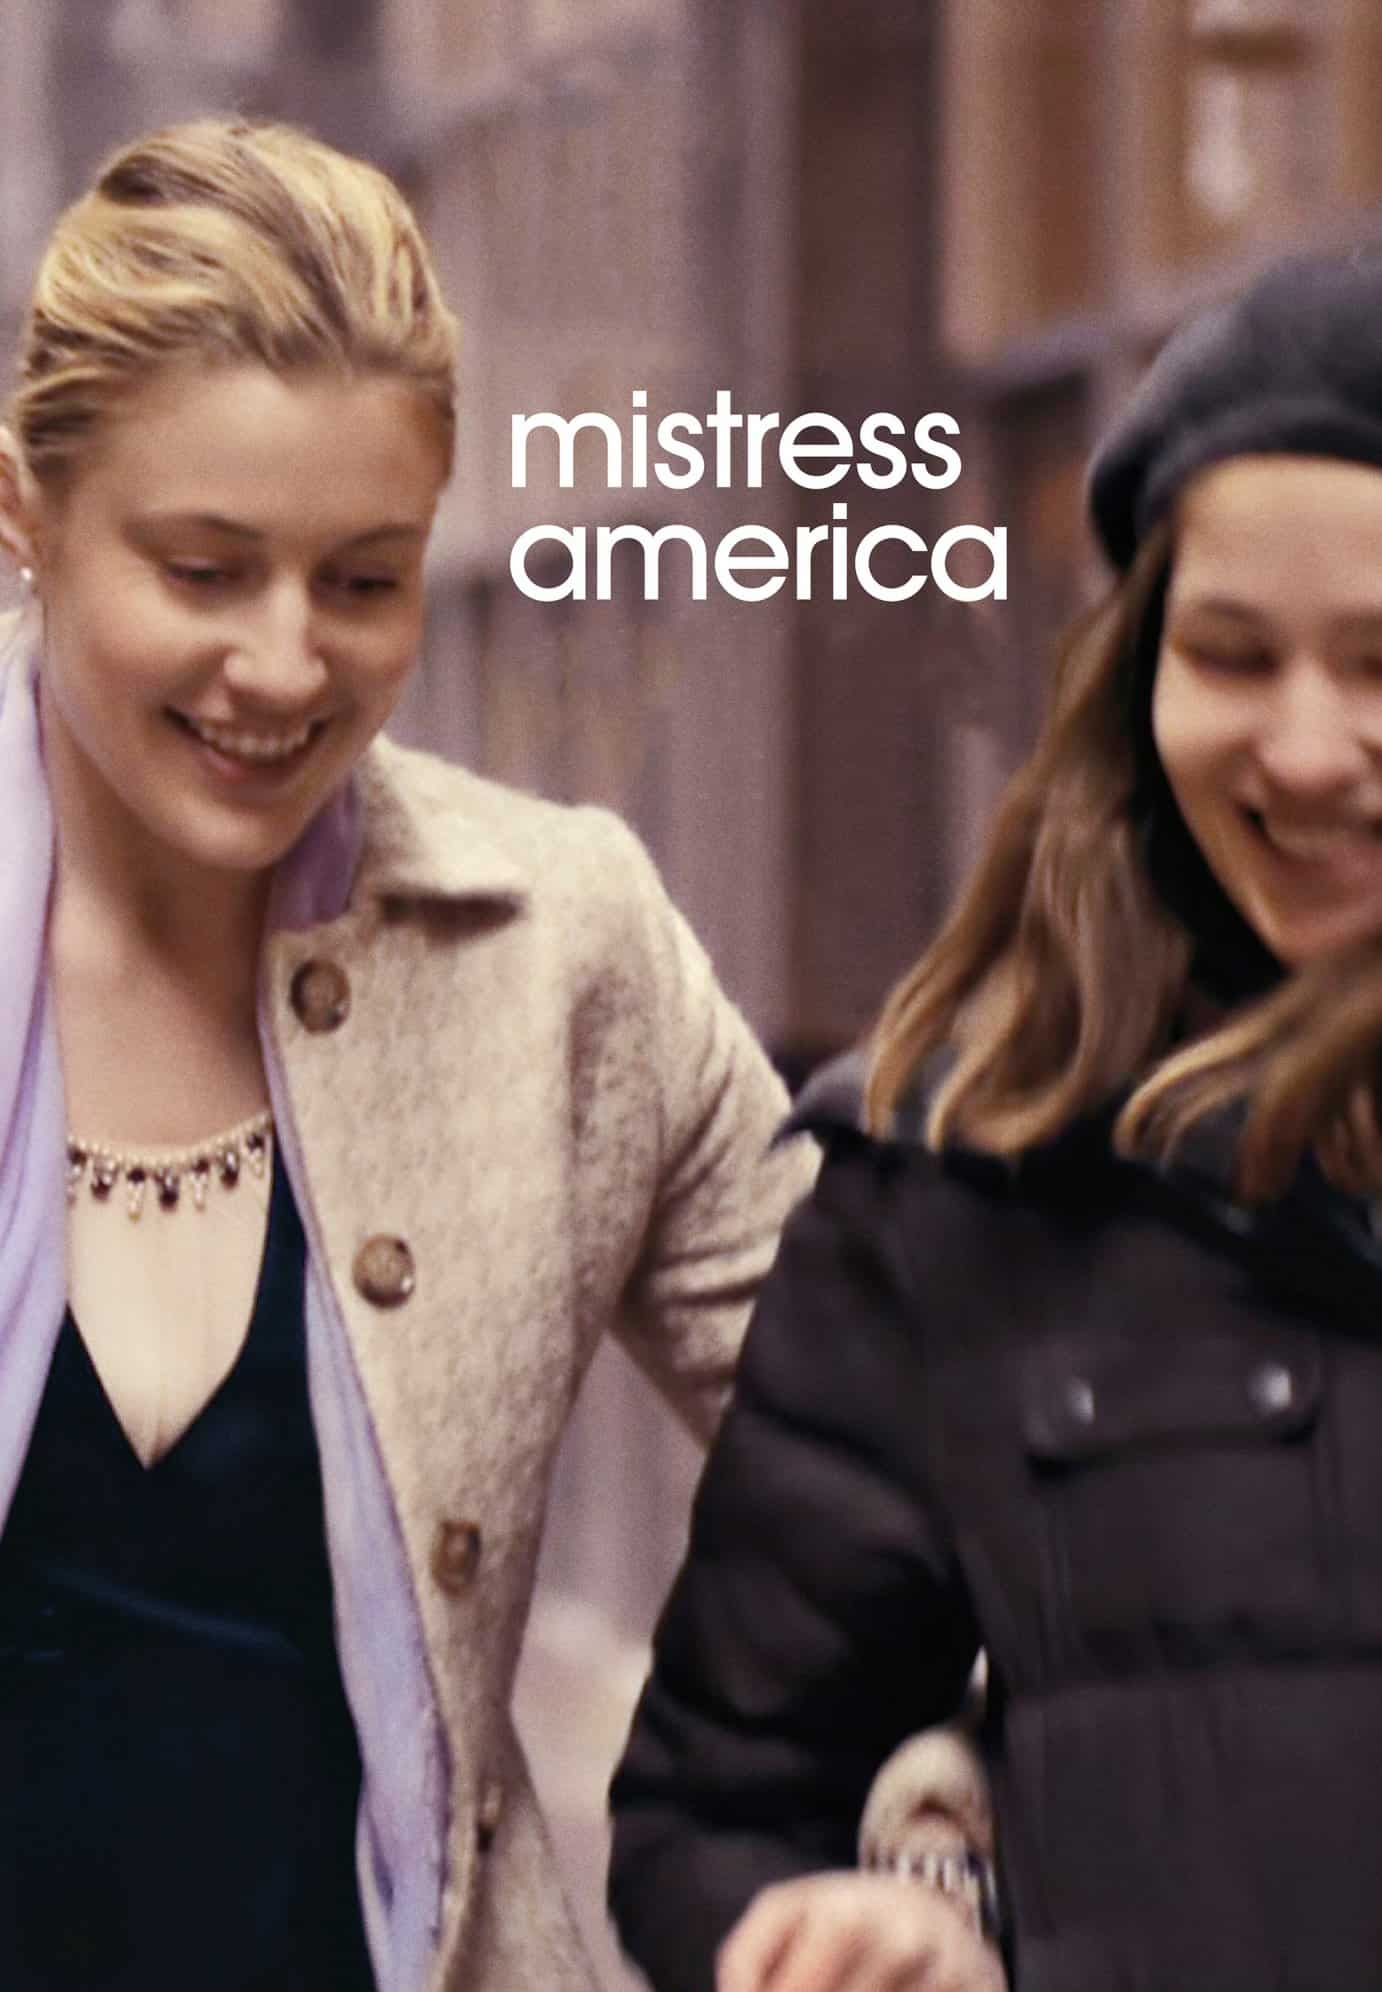 Mistress America, 2015